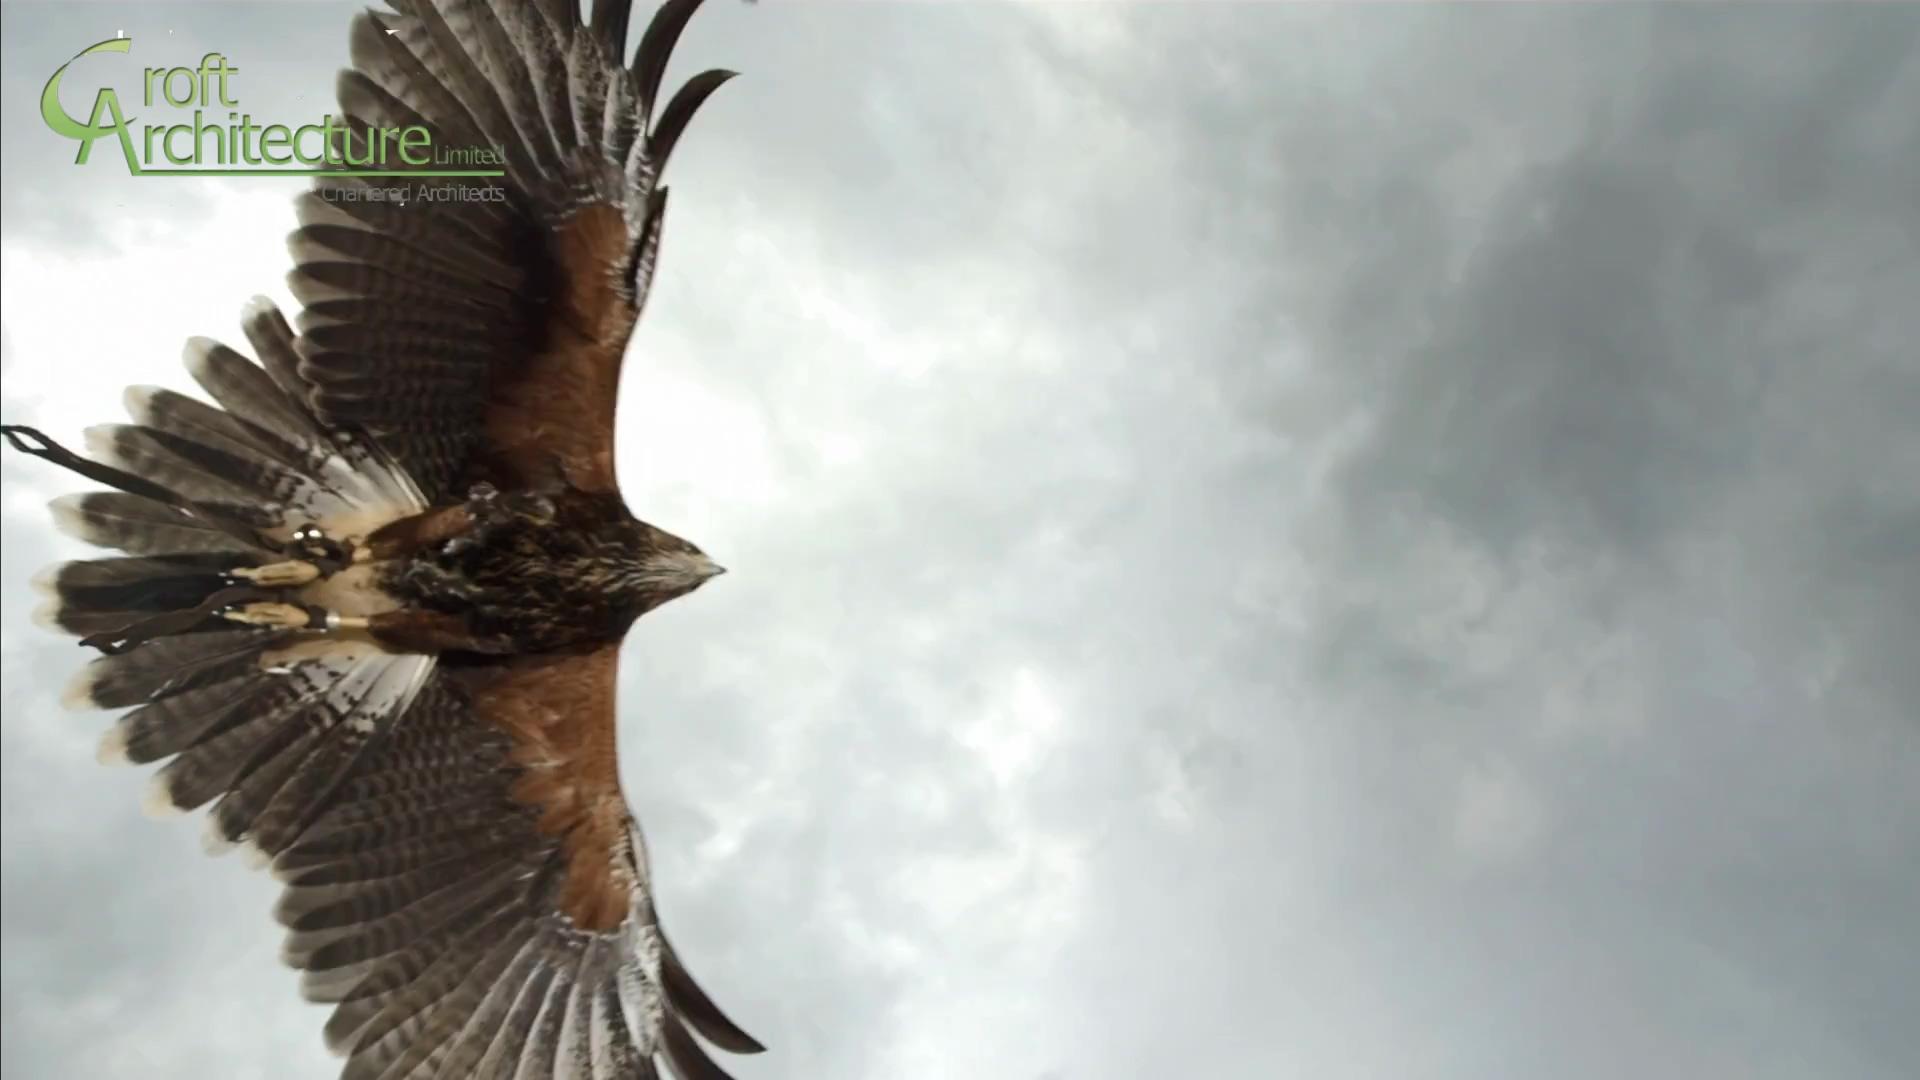 Staffordshire Wildlife _FULL_HD